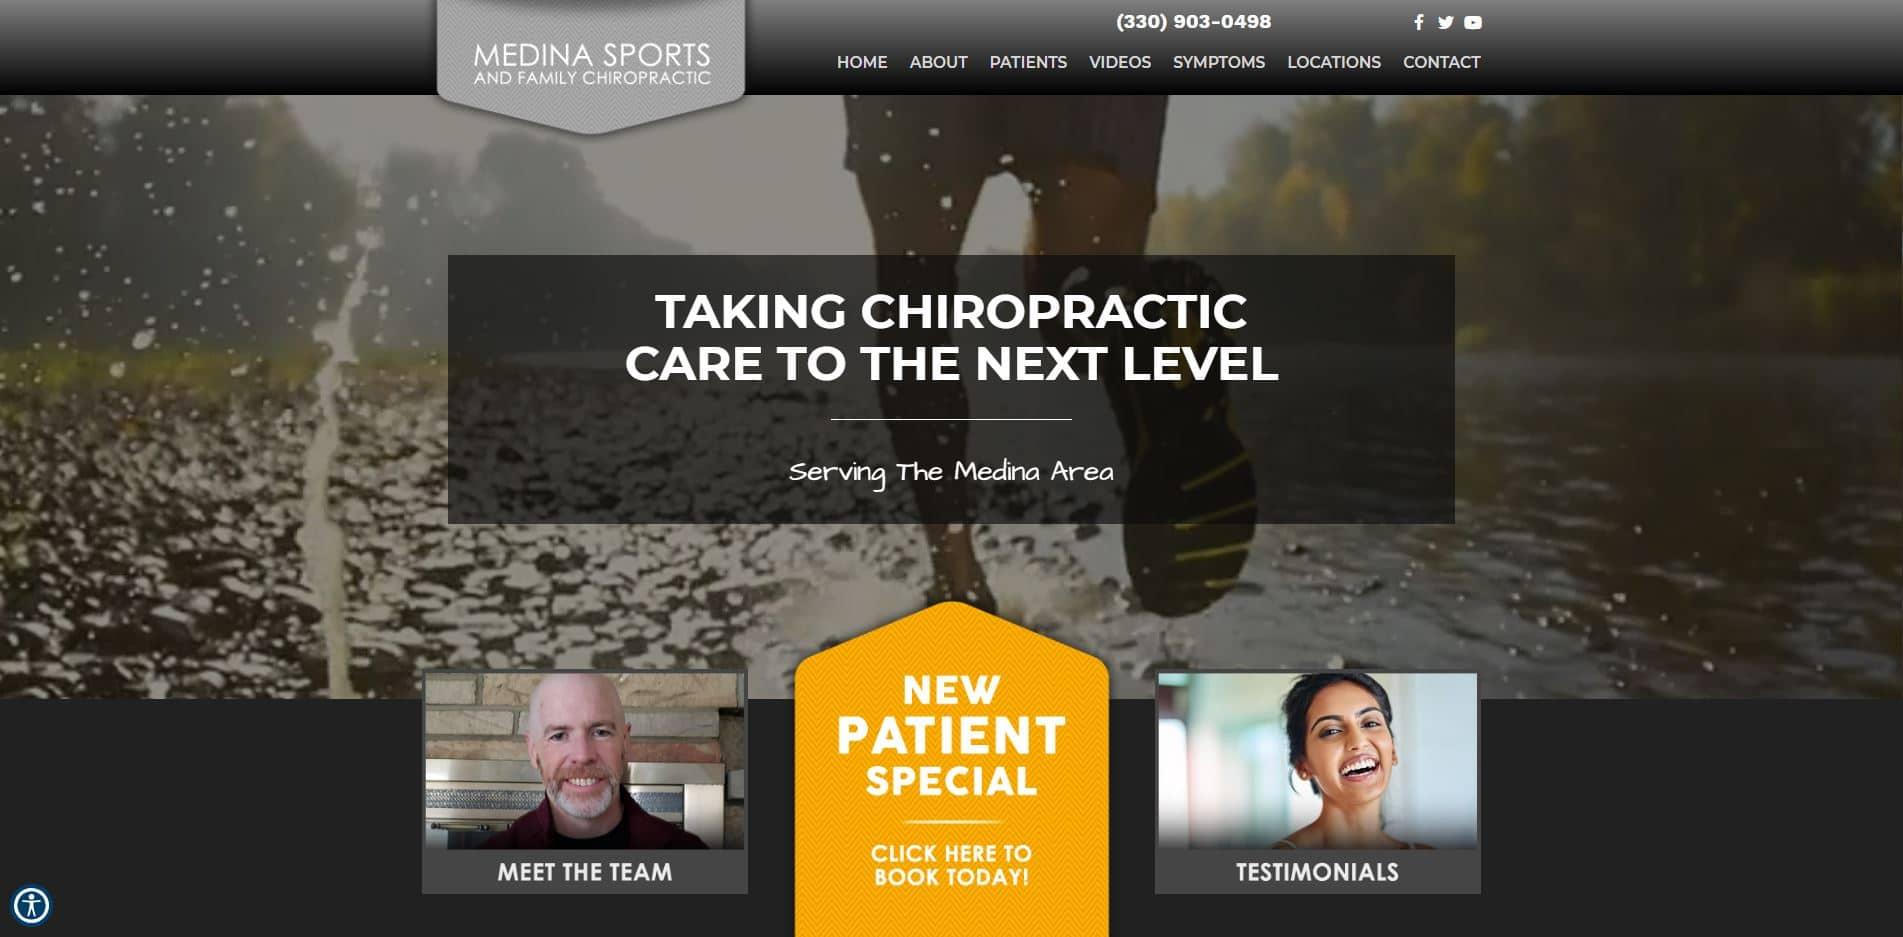 Chiropractor in Medina